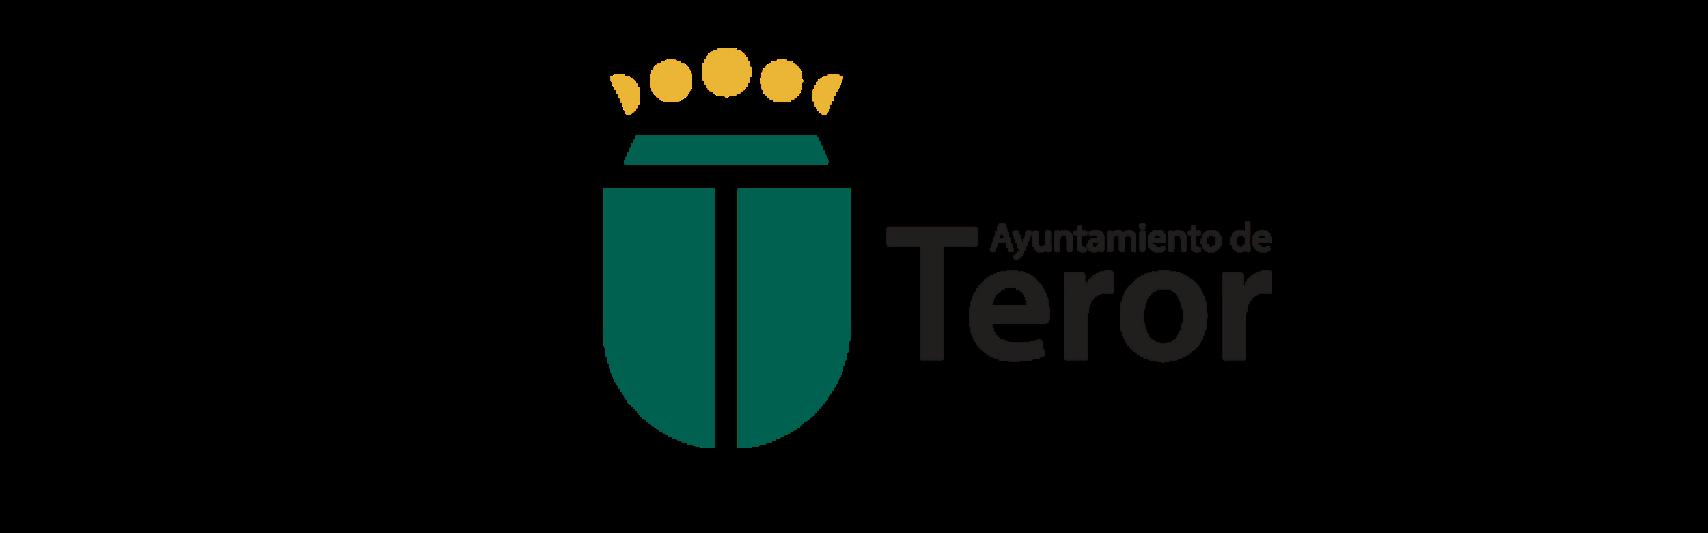 logo teror htal web - GCOM 2020